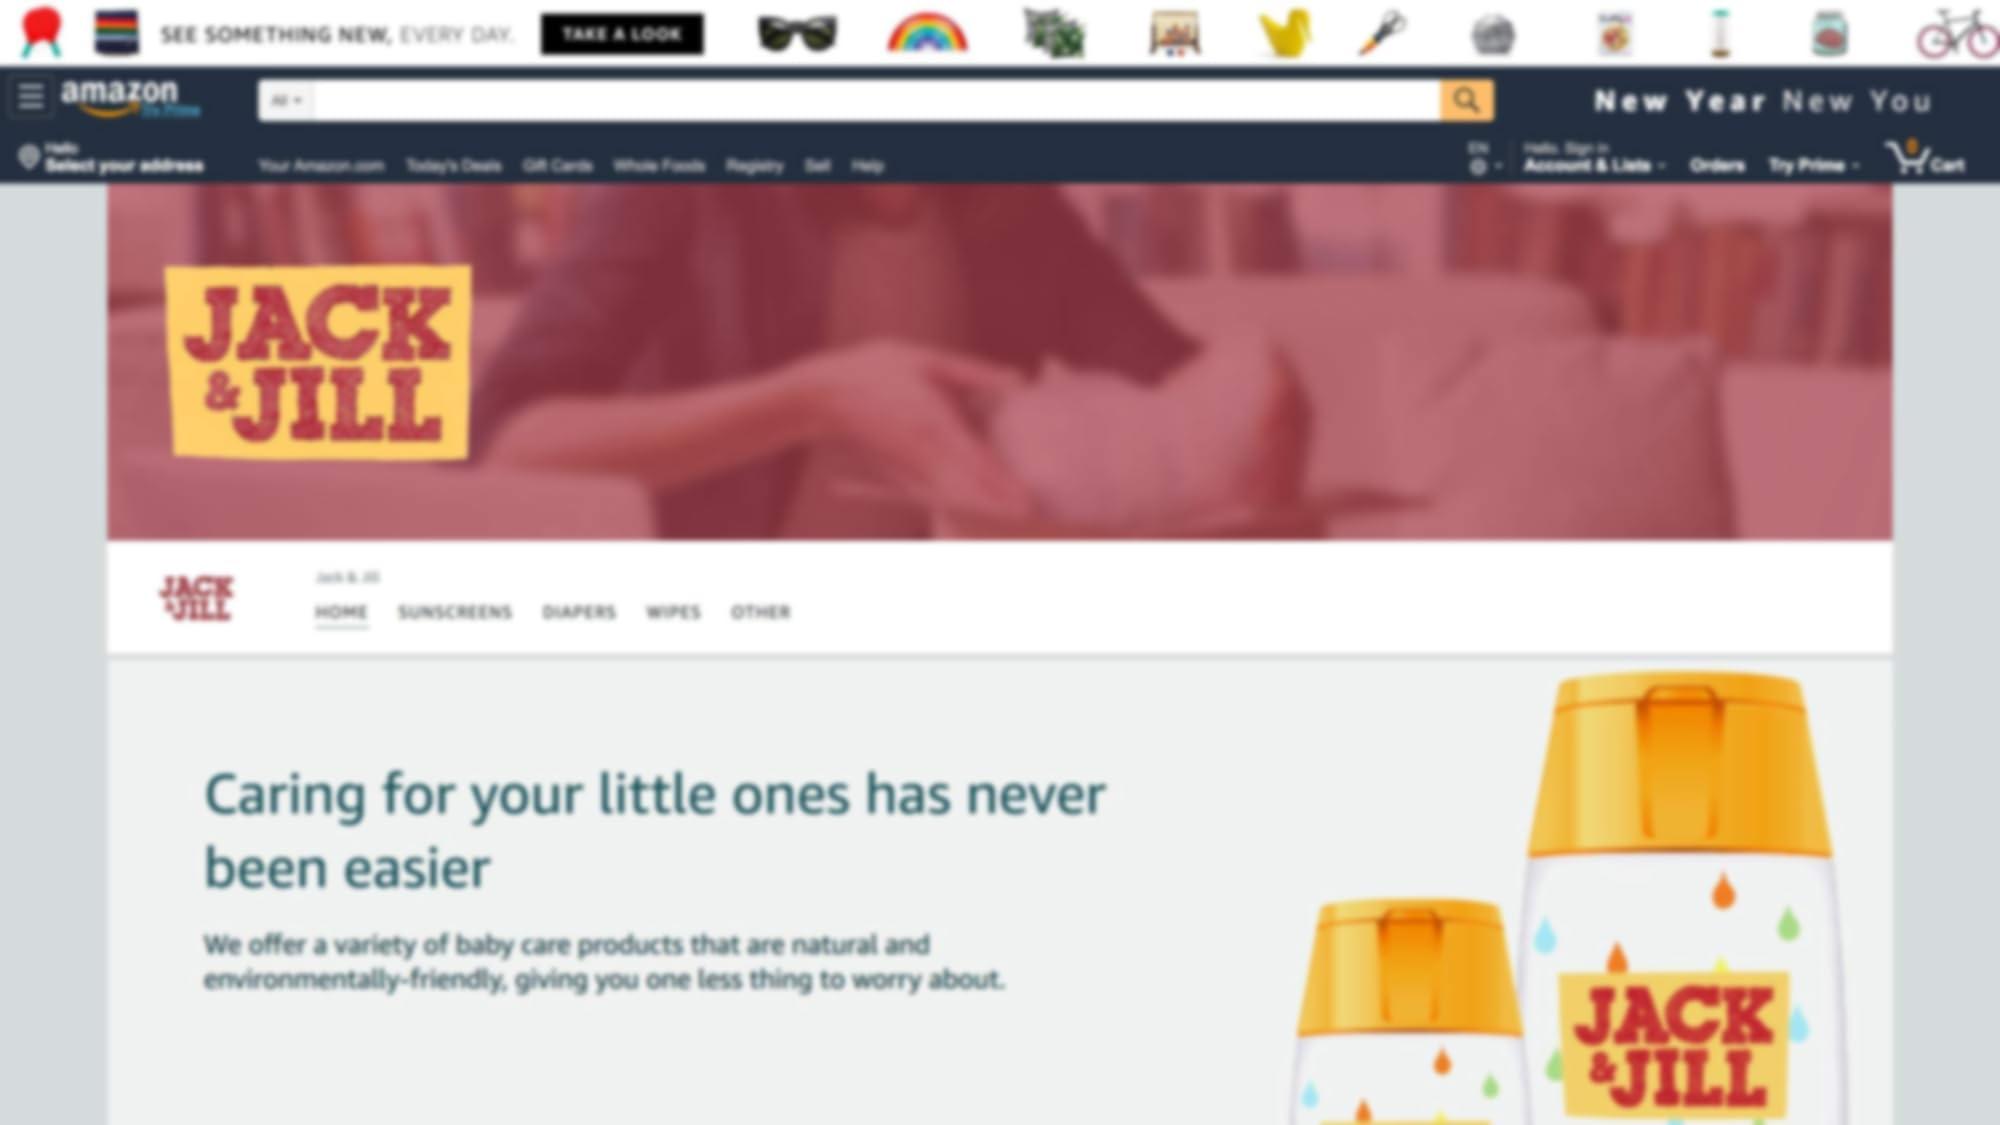 JACK&JILL的亚马逊品牌推广广告